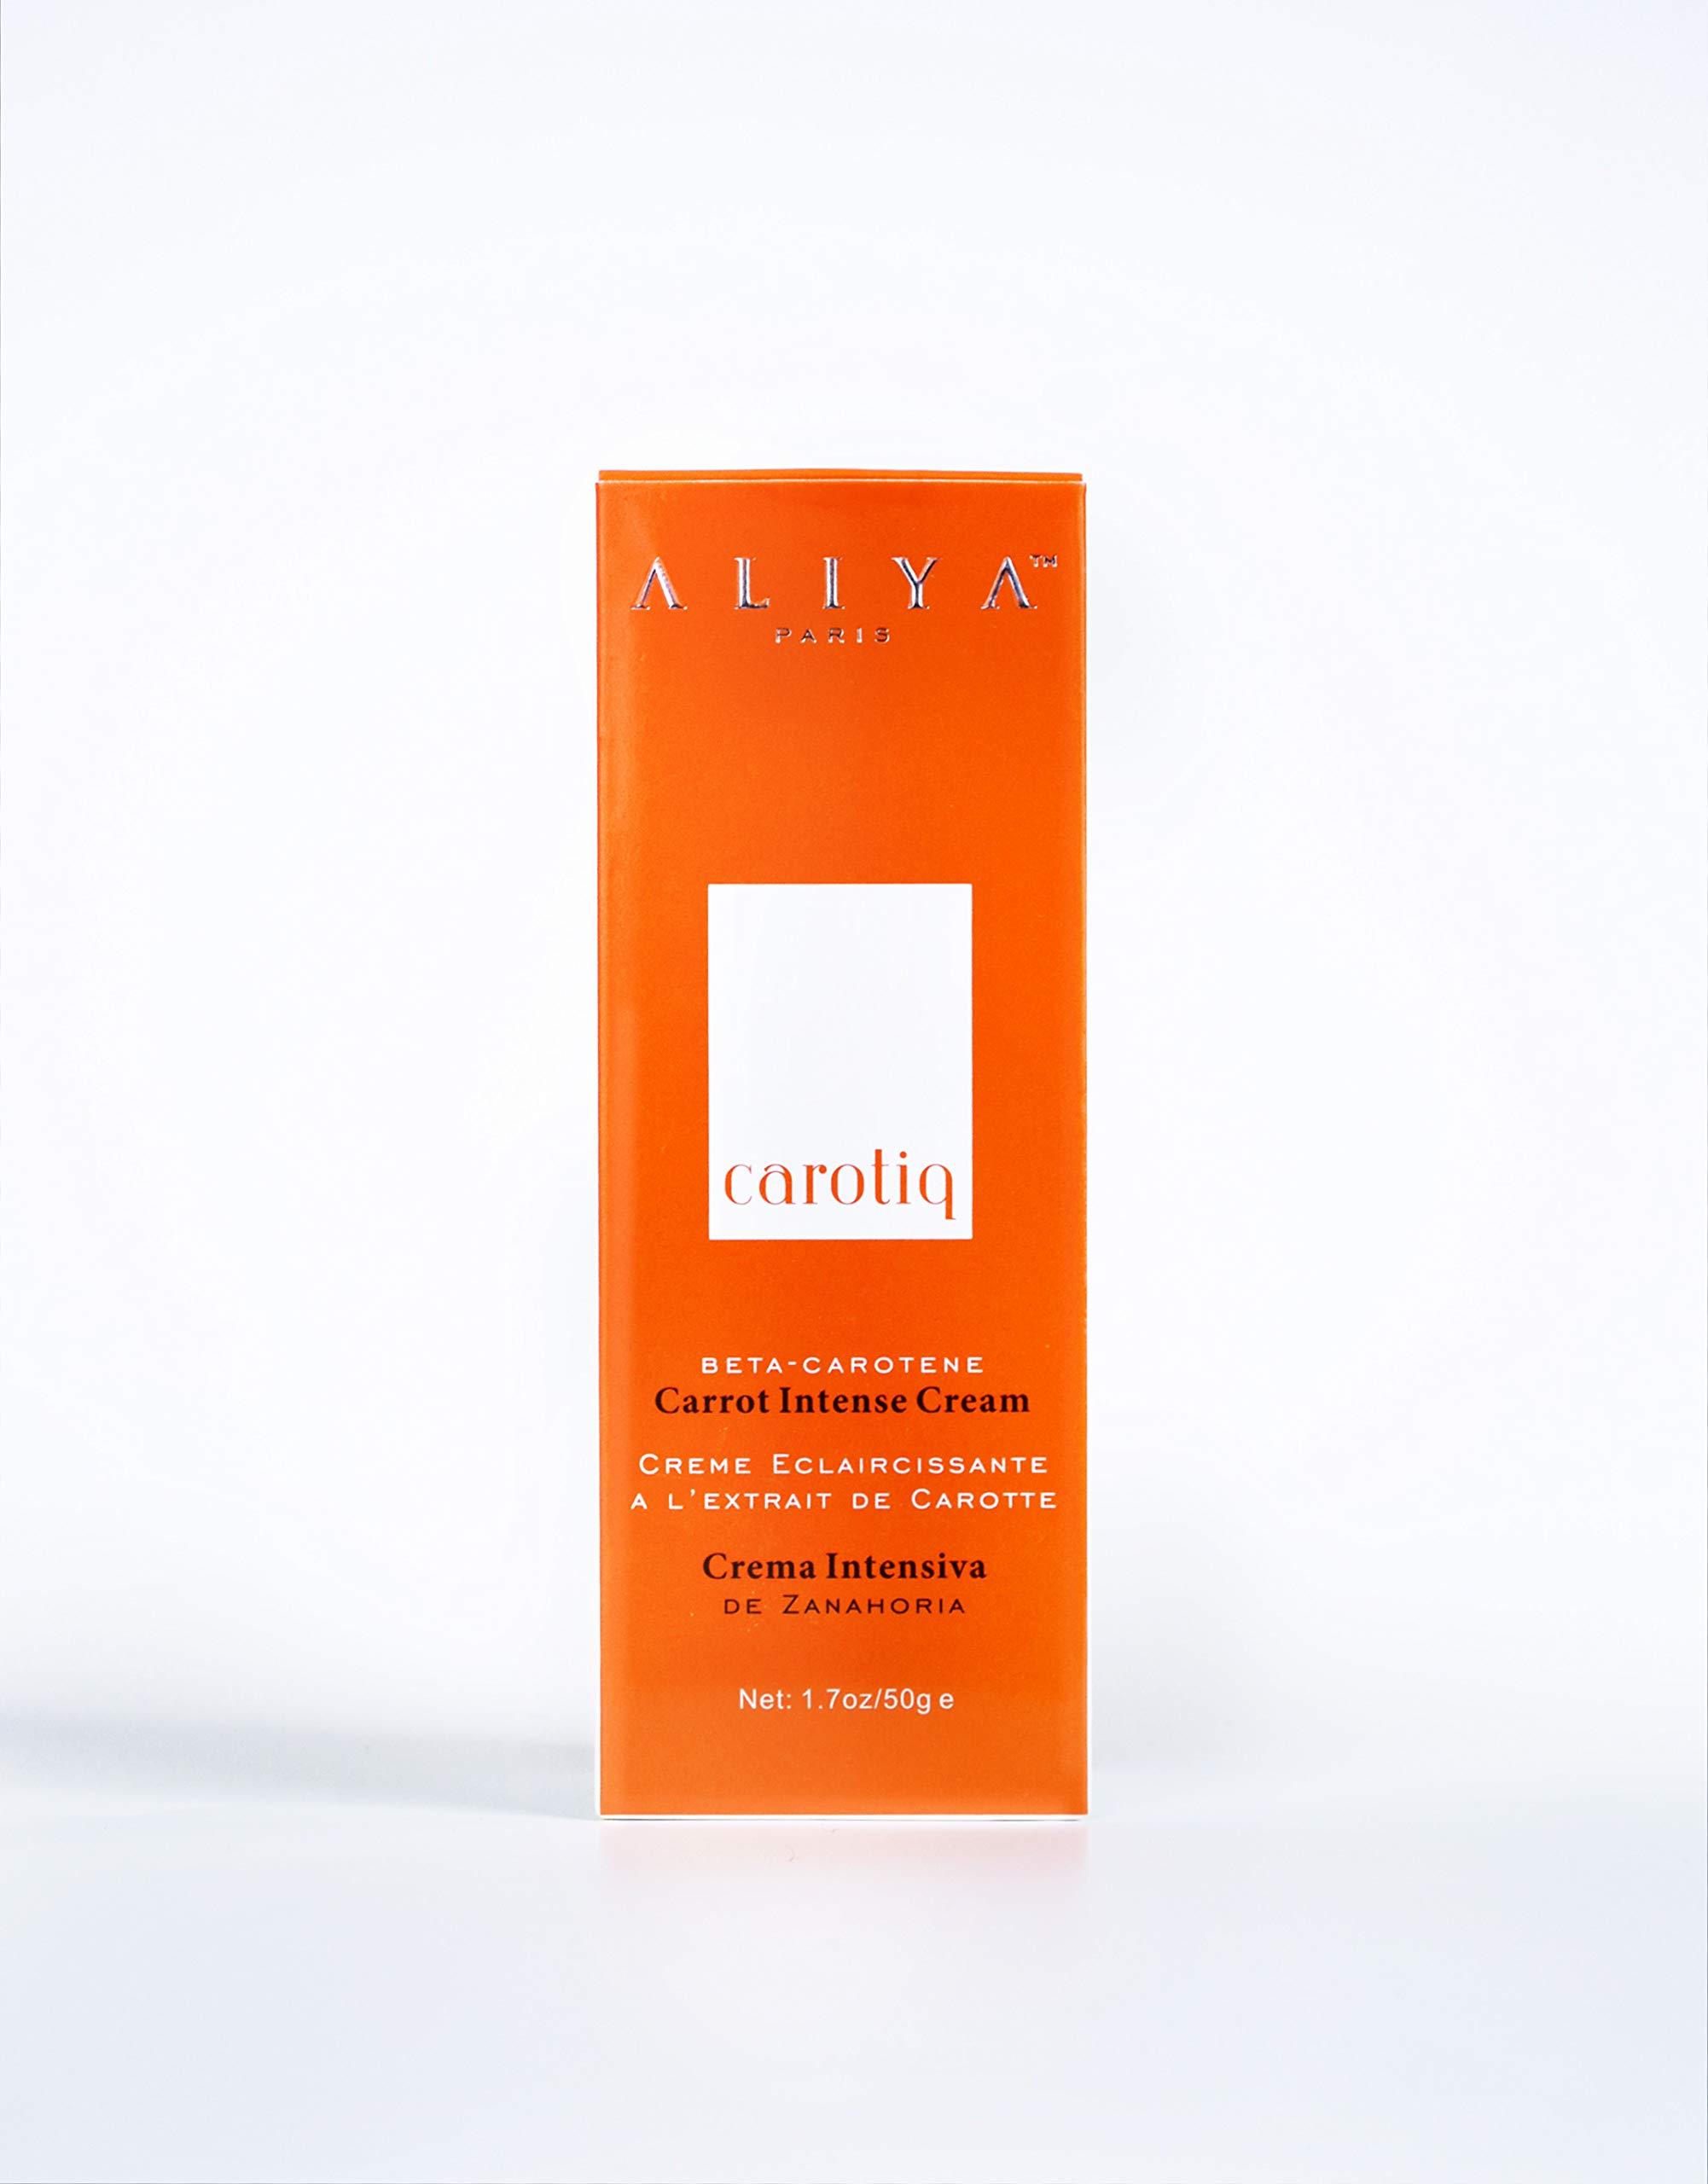 Aliya Paris Carotiq Carrot Cream 1.7 oz.